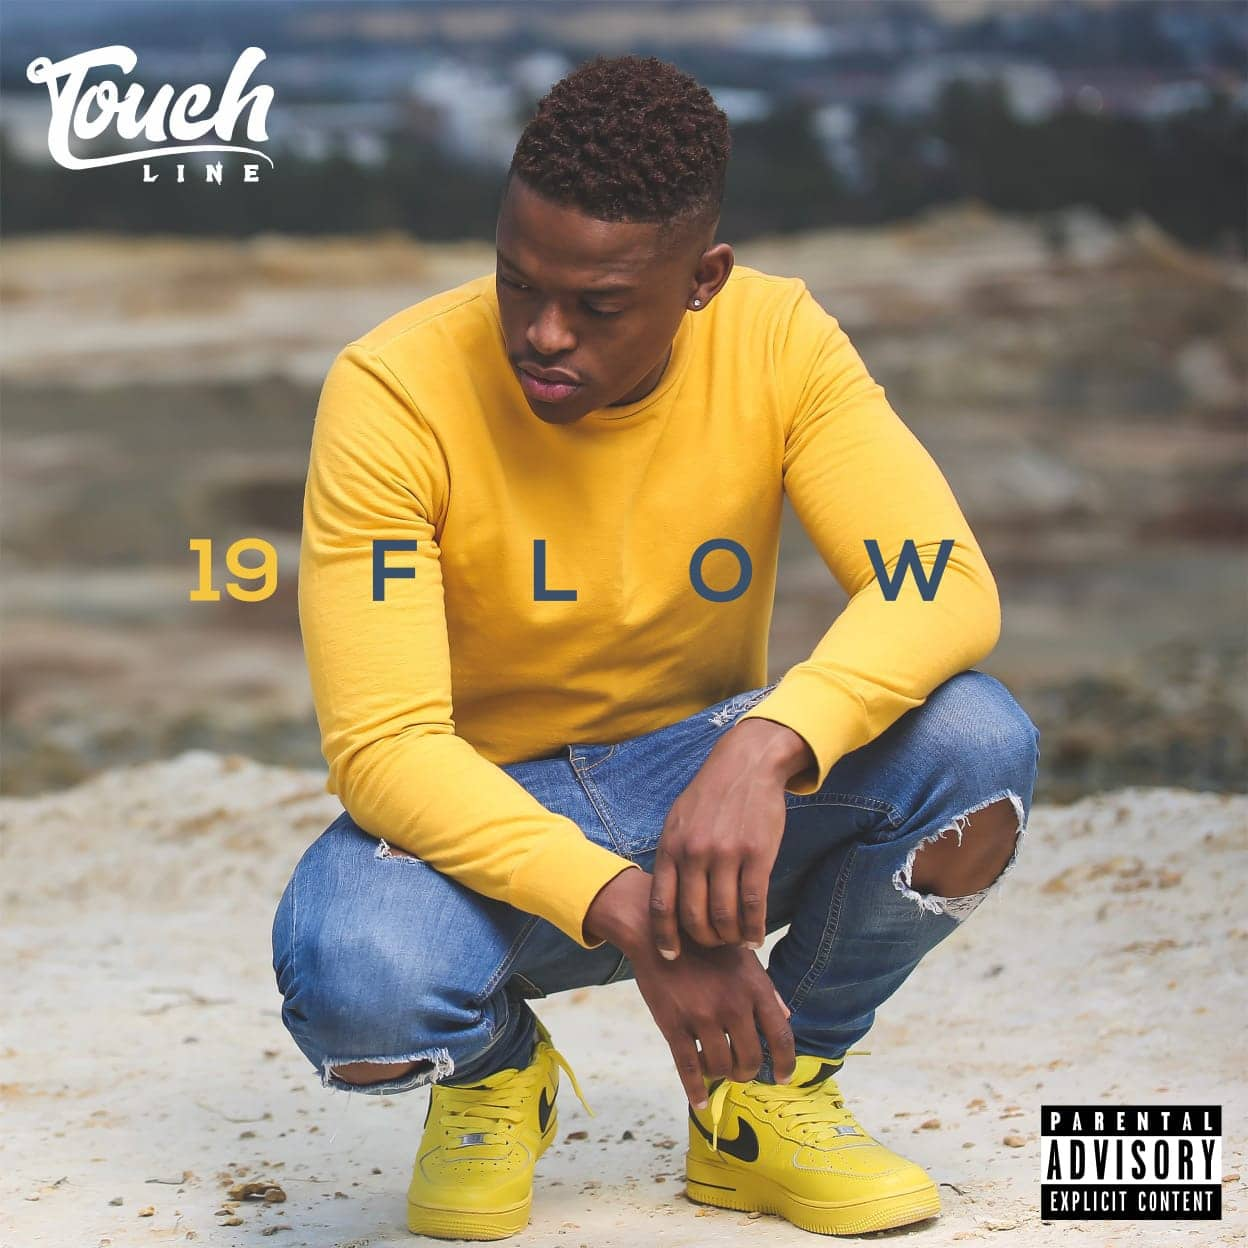 Touchline - 19 Flow (FULL ALBUM) Mp3 Zip Fast Download EP Free Audio Complete